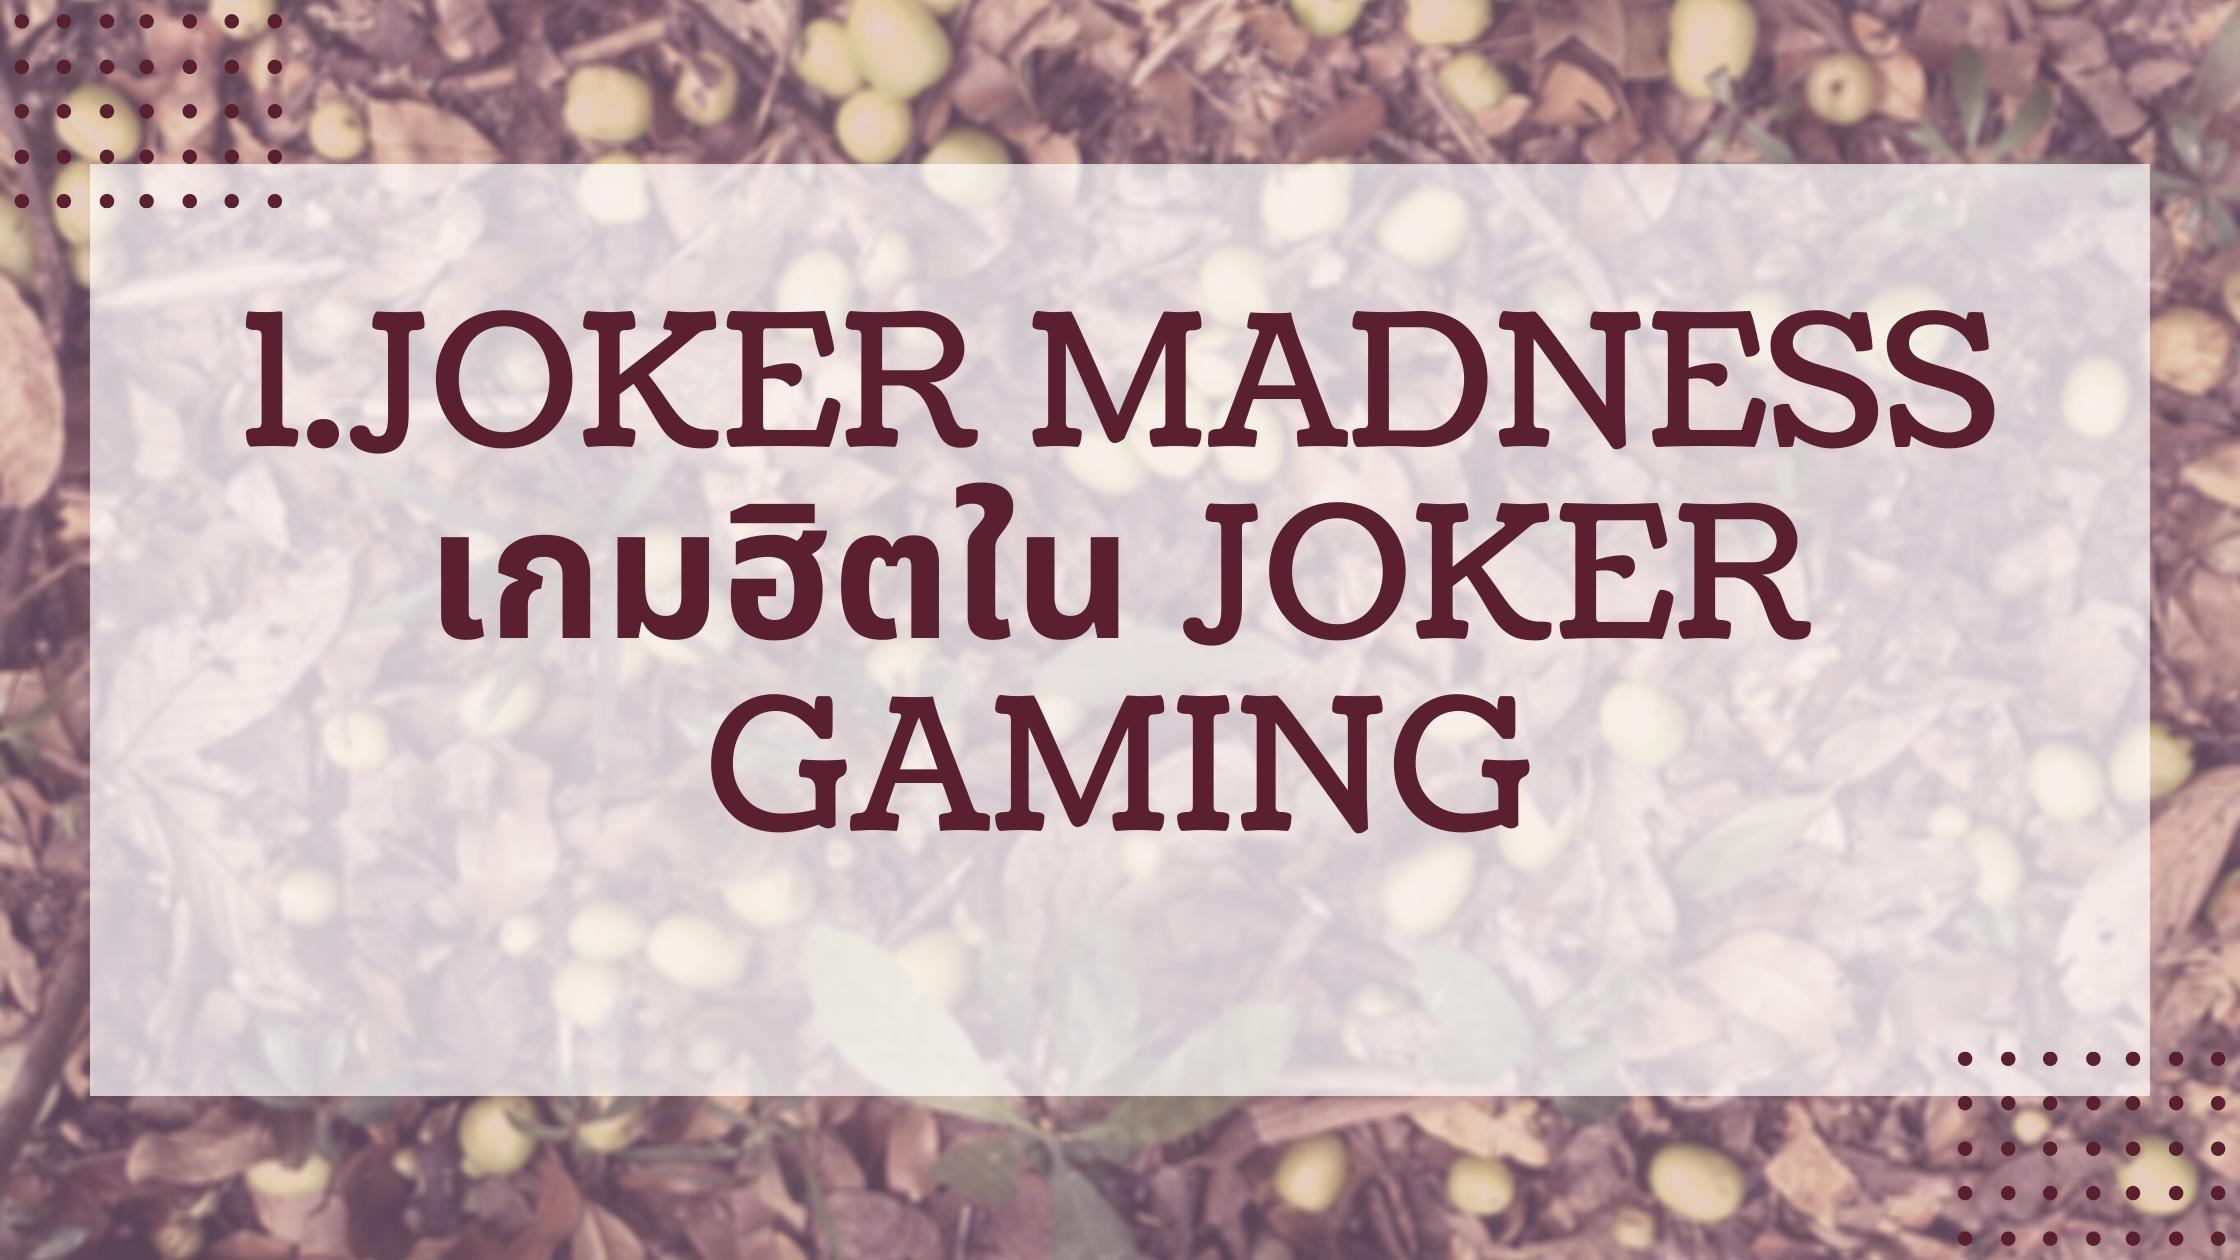 1.Joker Madness เกมฮิตใน joker gaming